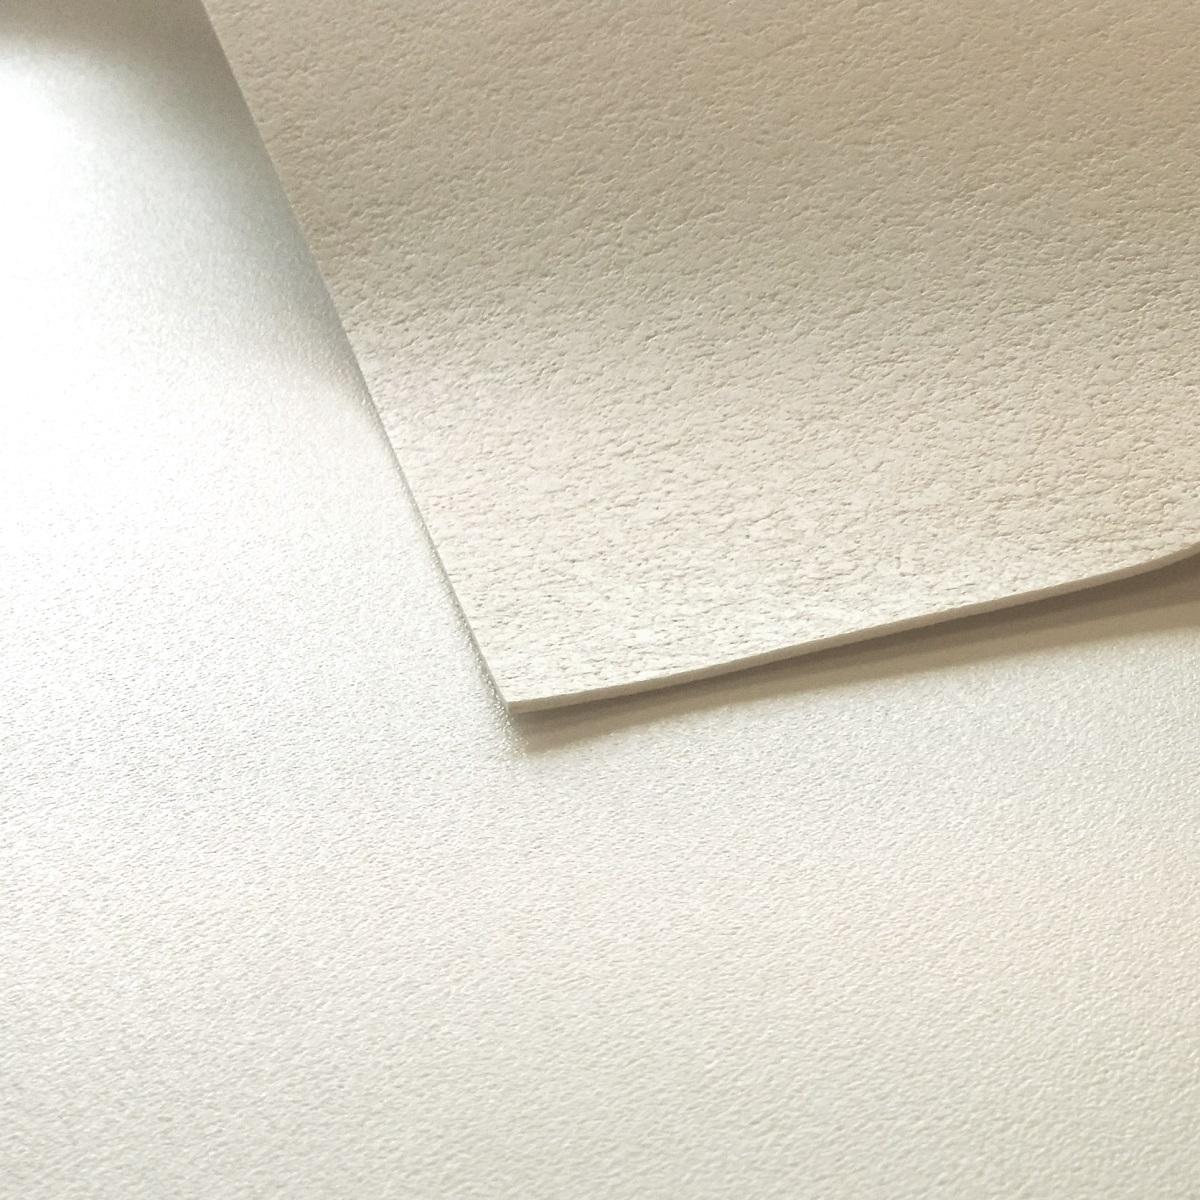 tapis vinyle carrelages mixtes 60 x 100 cm stickers. Black Bedroom Furniture Sets. Home Design Ideas